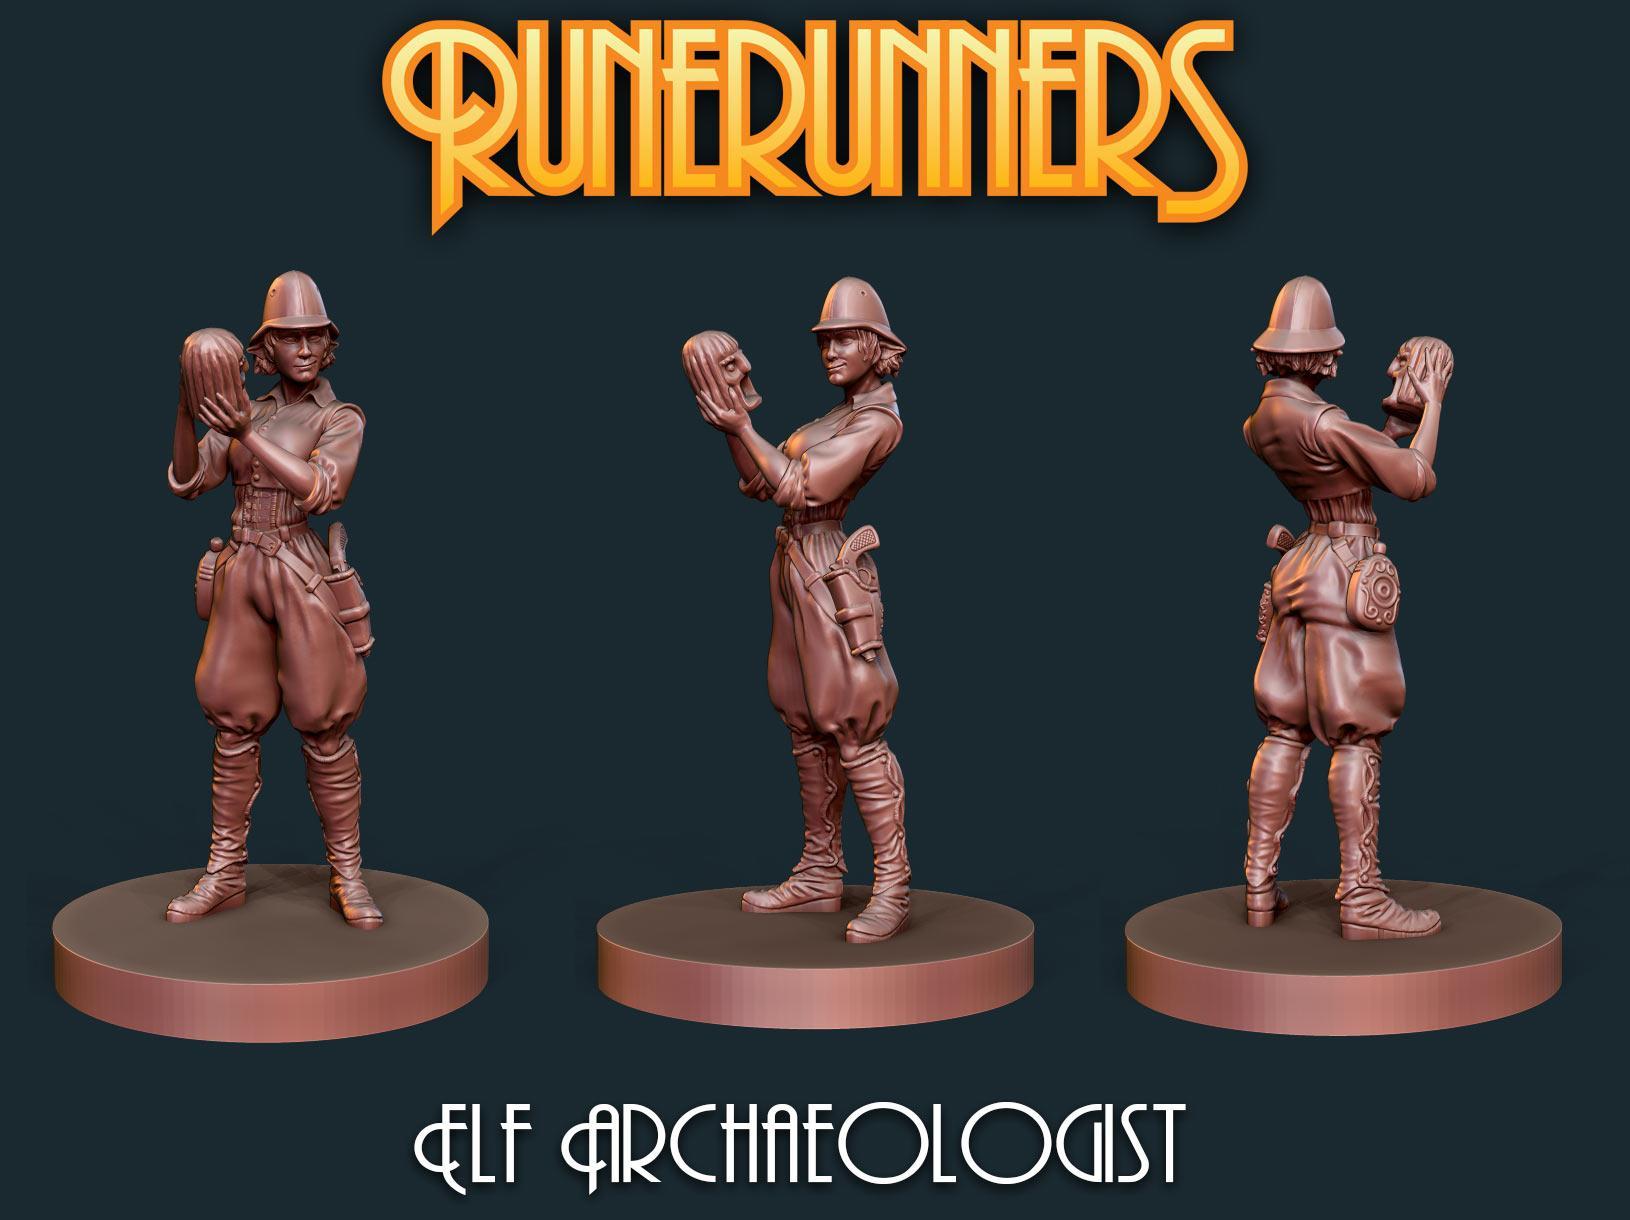 Runerunners Elf Archaeologist